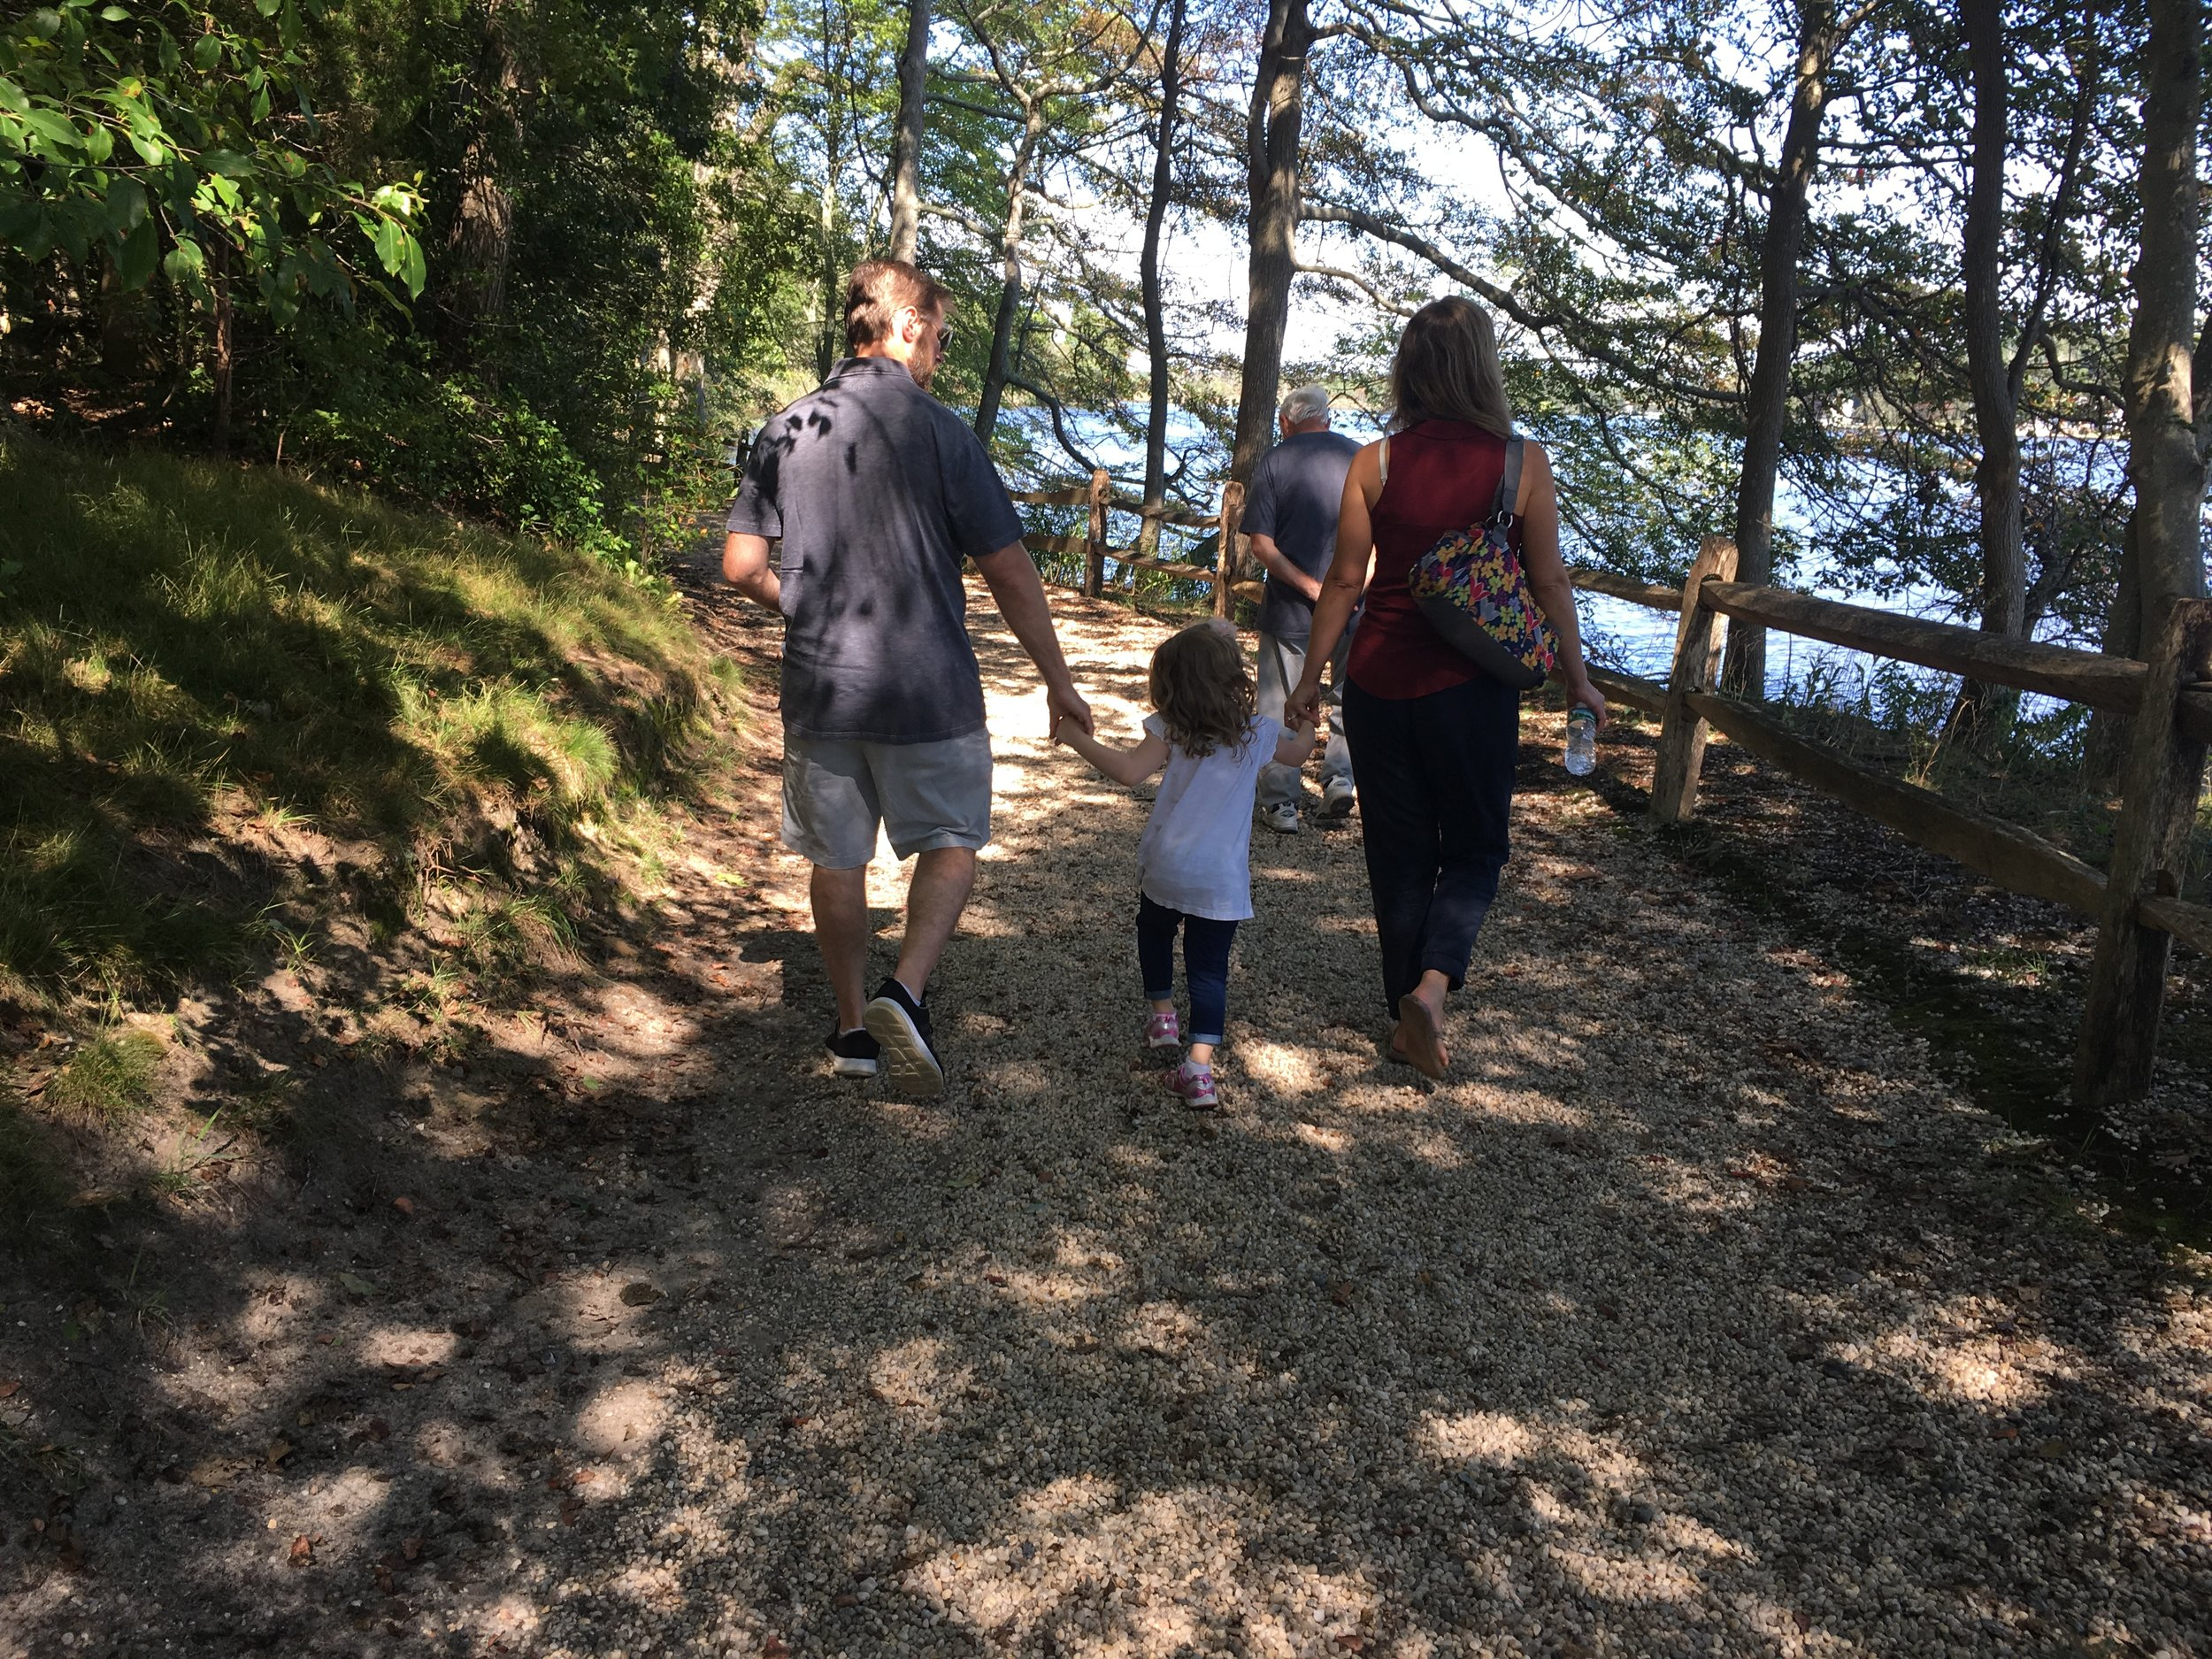 A walk on Grandma's birthday